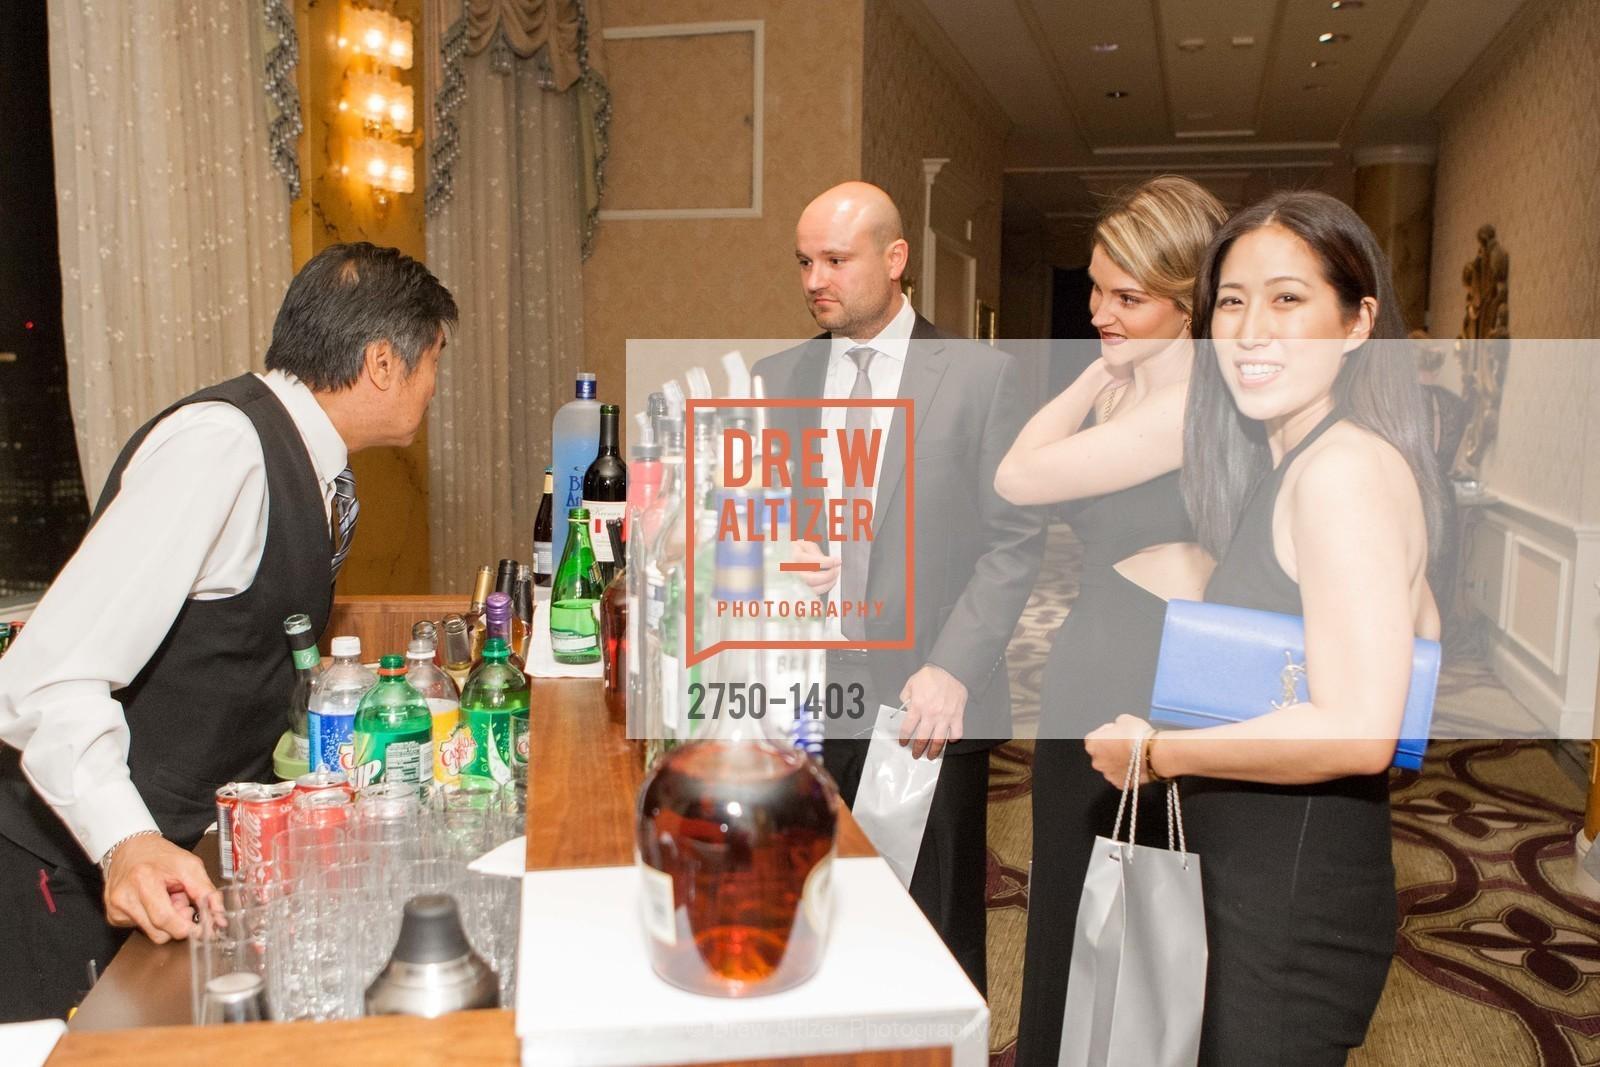 Matt McGonaghy, Robyn Ferguson, Jennifer Kim, Photo #2750-1403